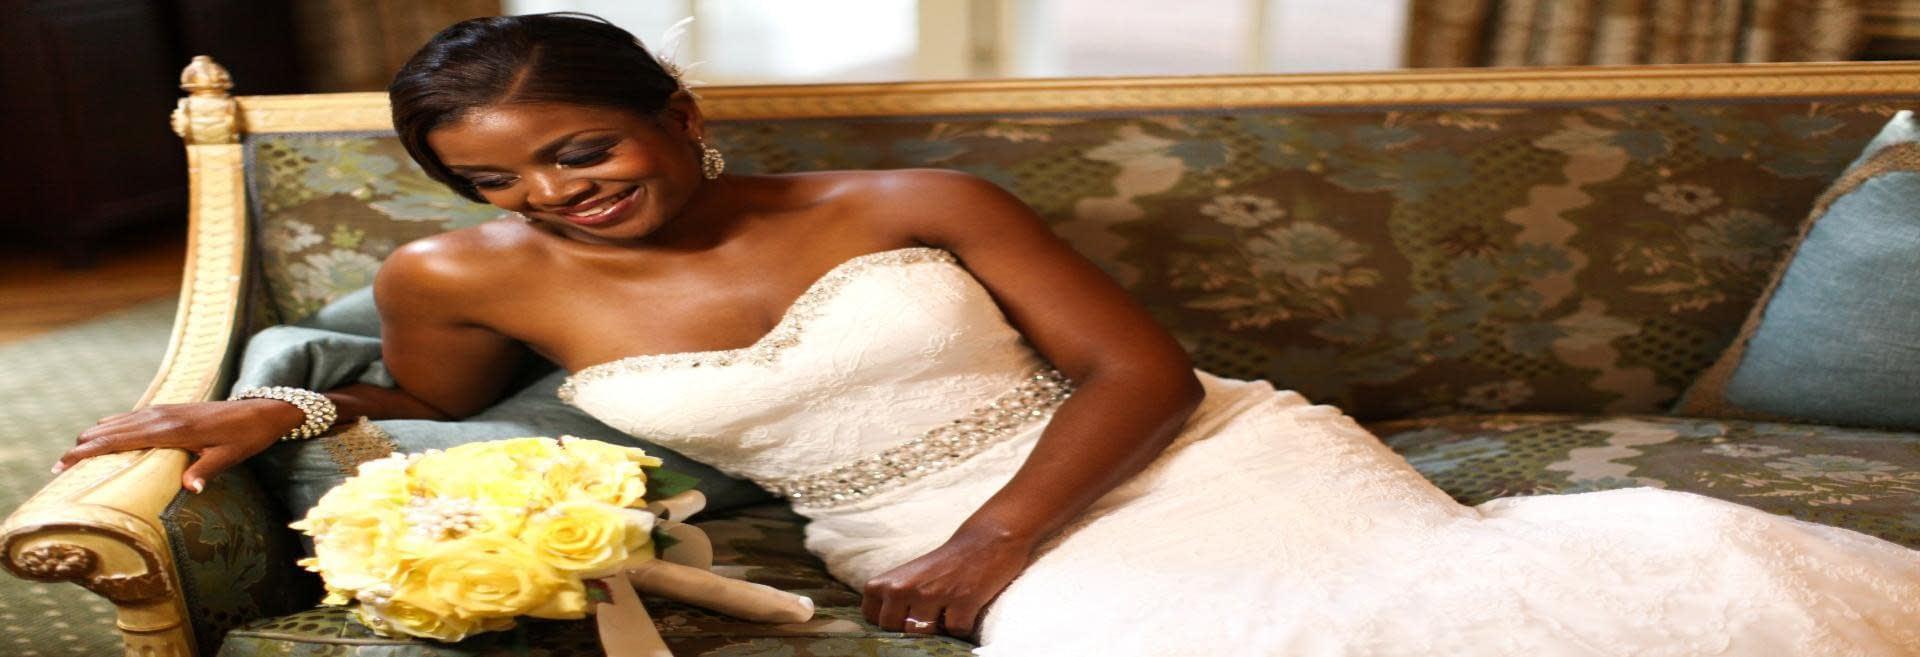 Premarital Bride